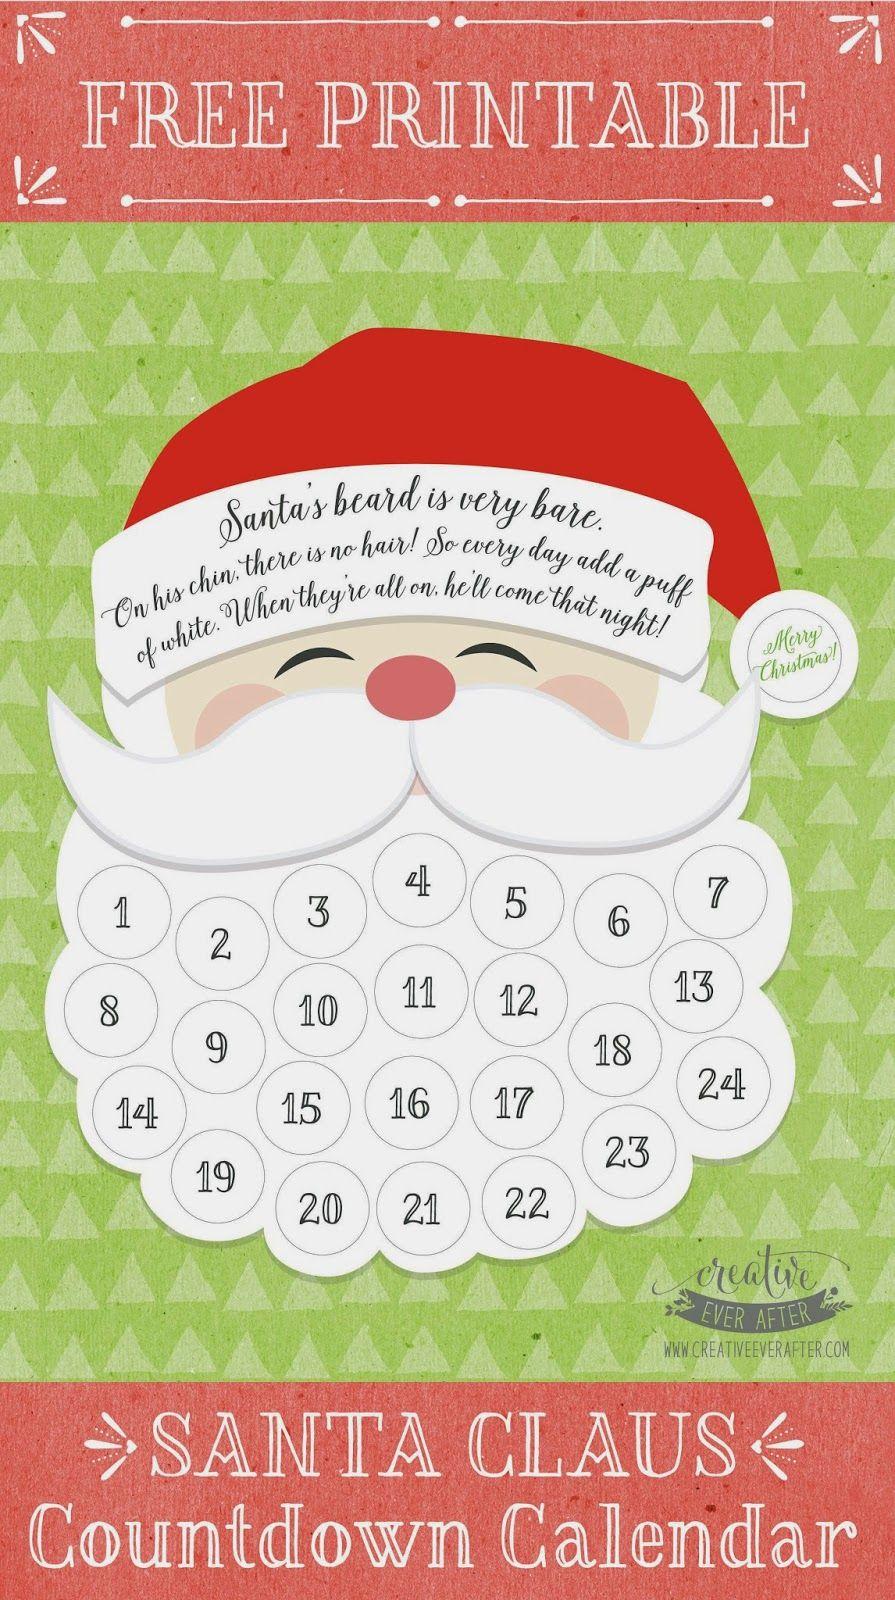 Free Printable Santa Claus Beard Countdown Calendar